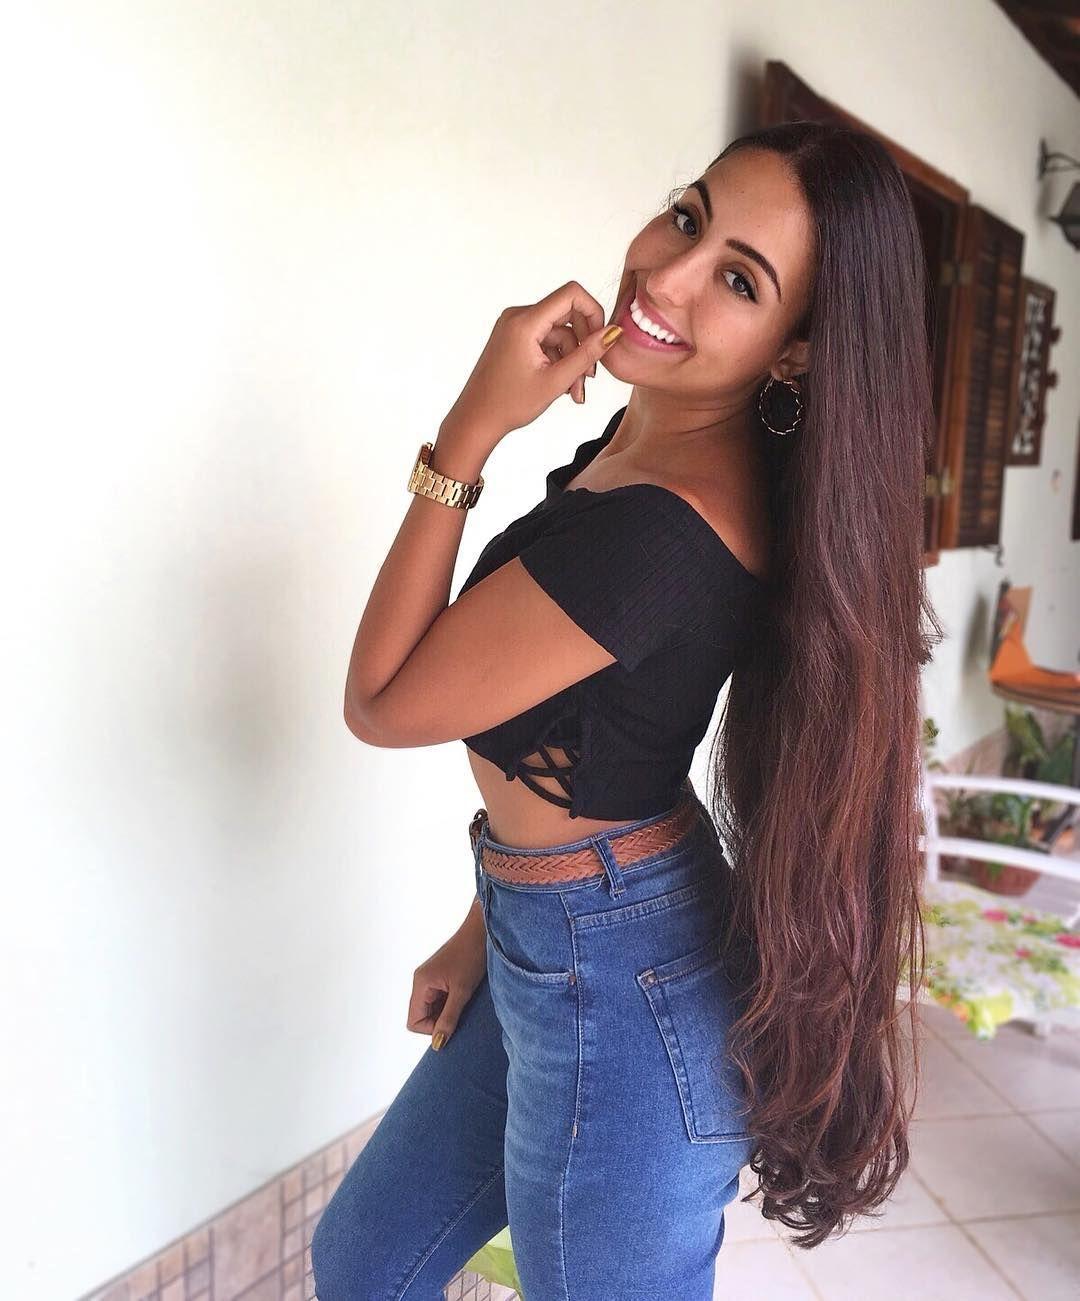 #hair #longhair | Long Hair Goals | Long hair styles, Long ...